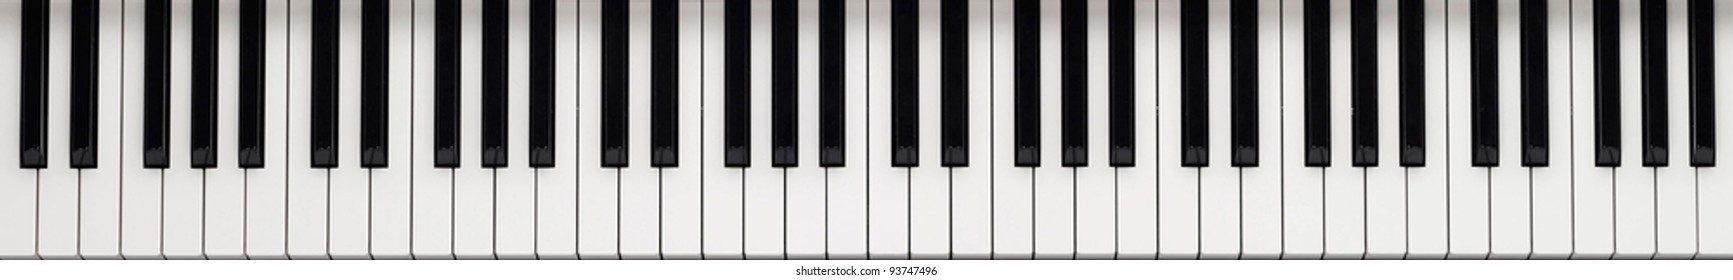 Piano keyboard background